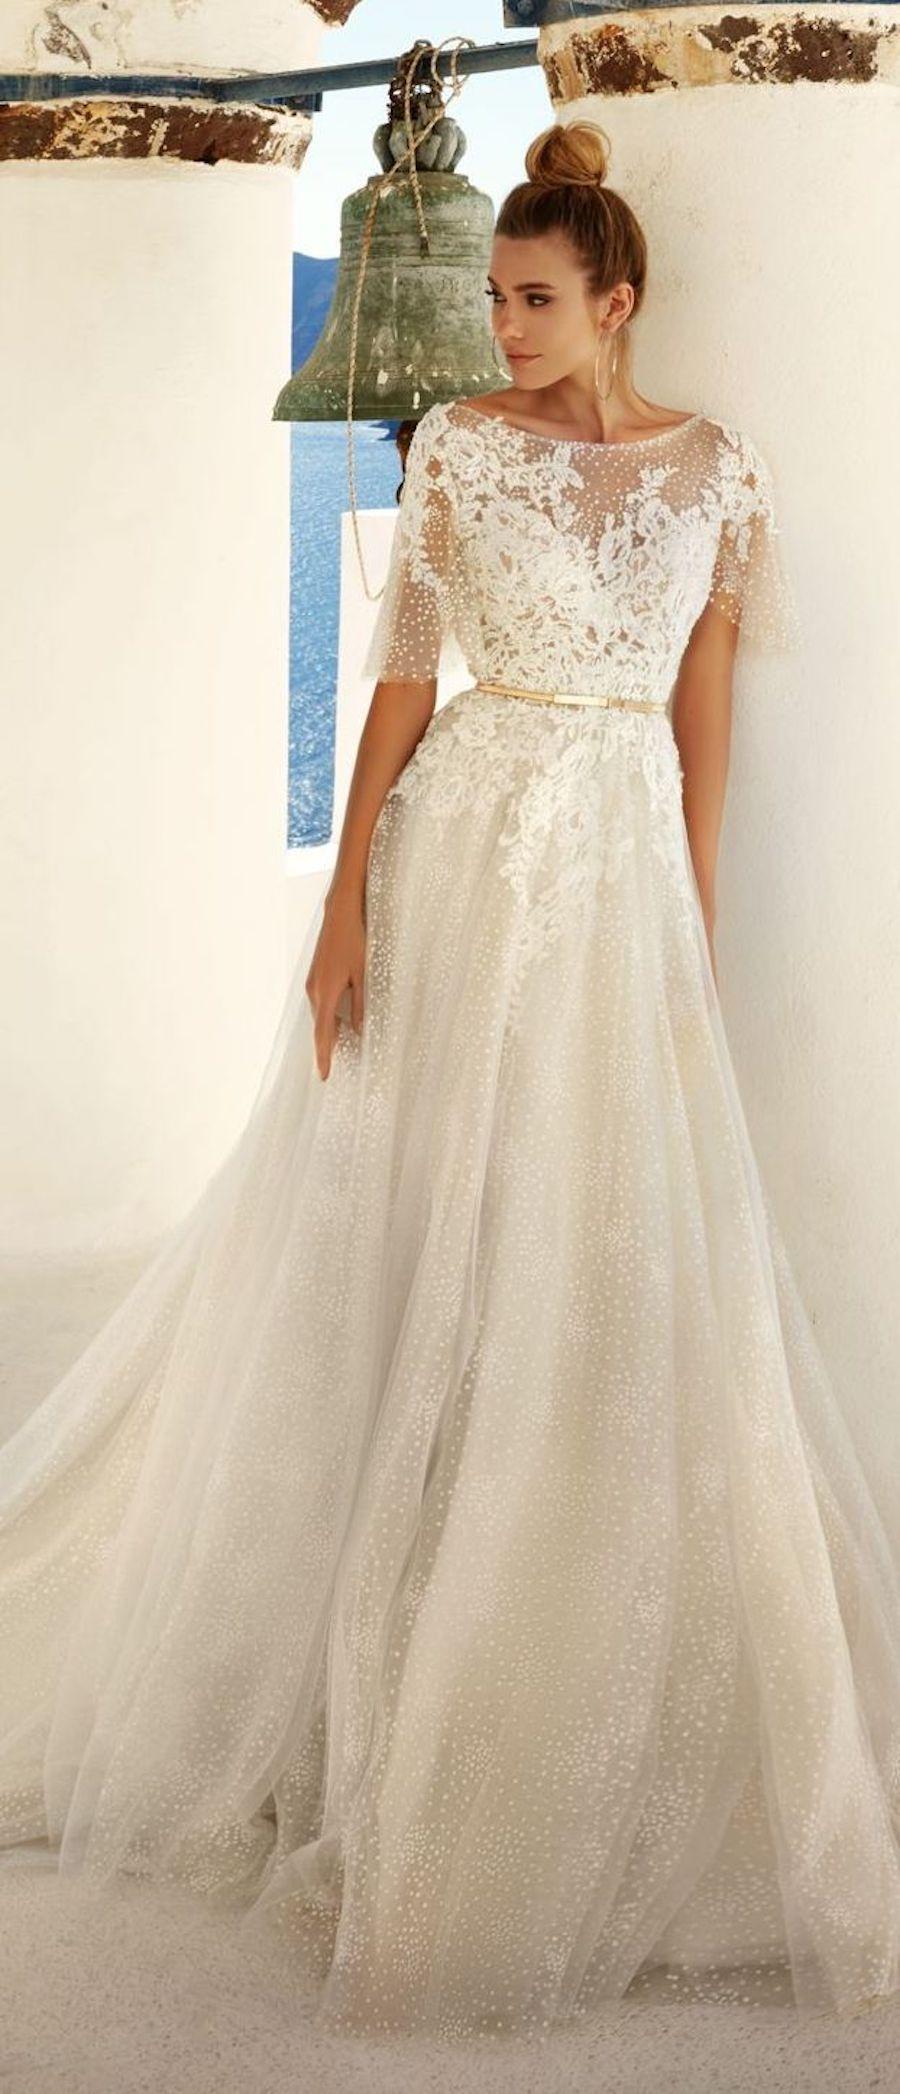 Lace up back wedding dress november 2018 Eva Lendel Wedding Dress Collection   Wedding November